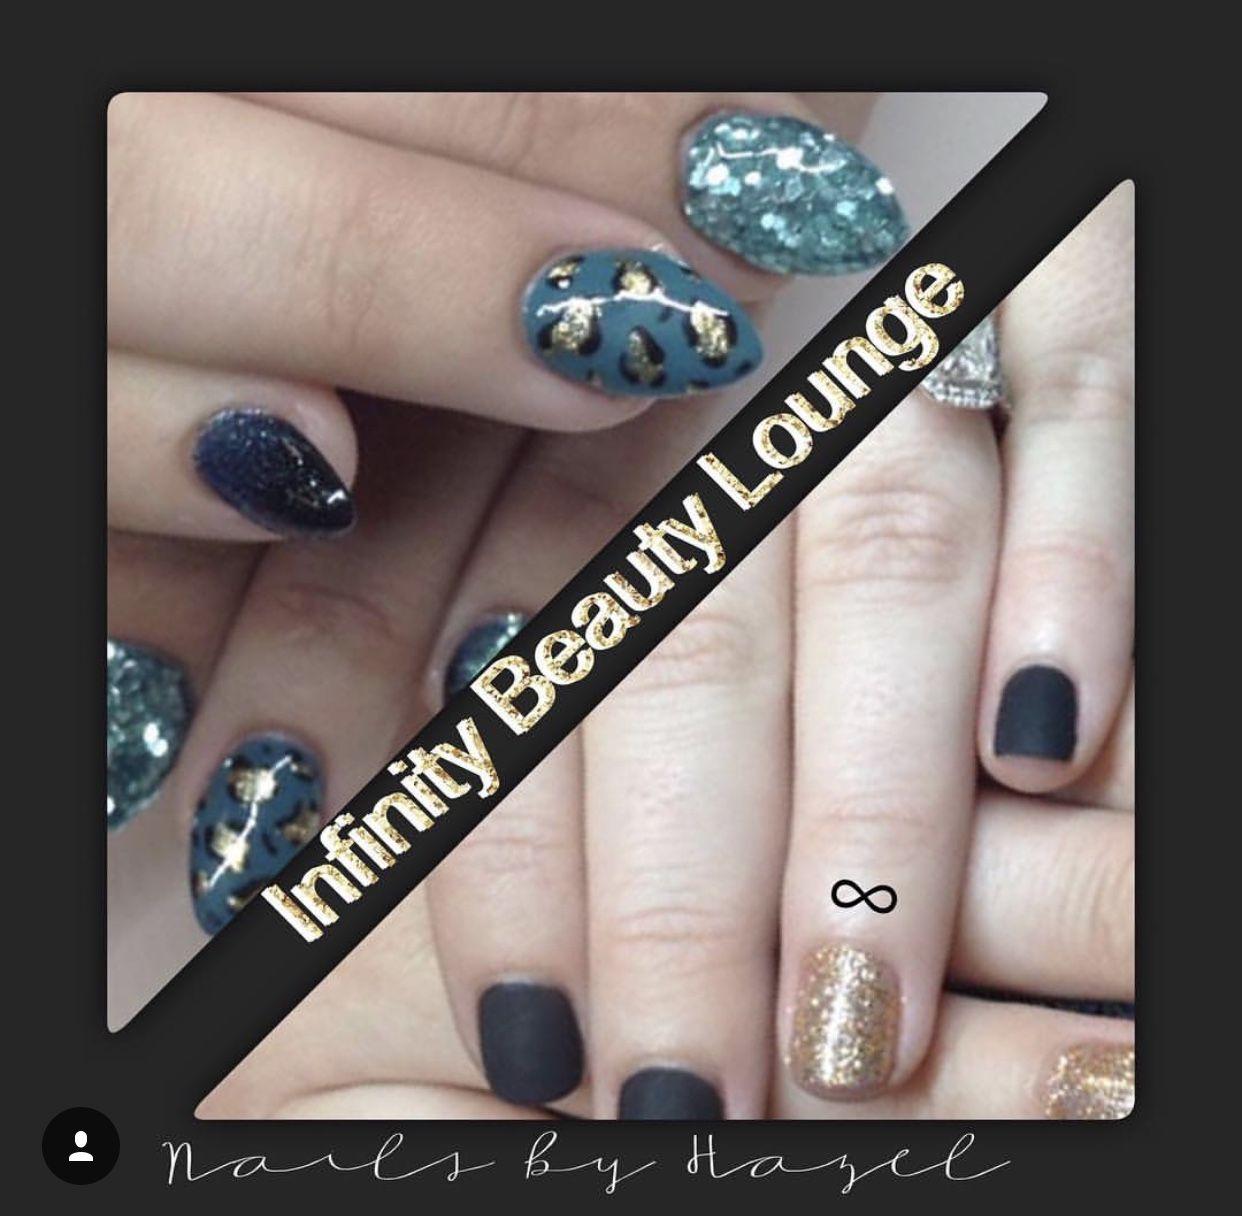 Infinity Beauty Jax 904 274 9333 Located At 3864 San Jose Park Dr